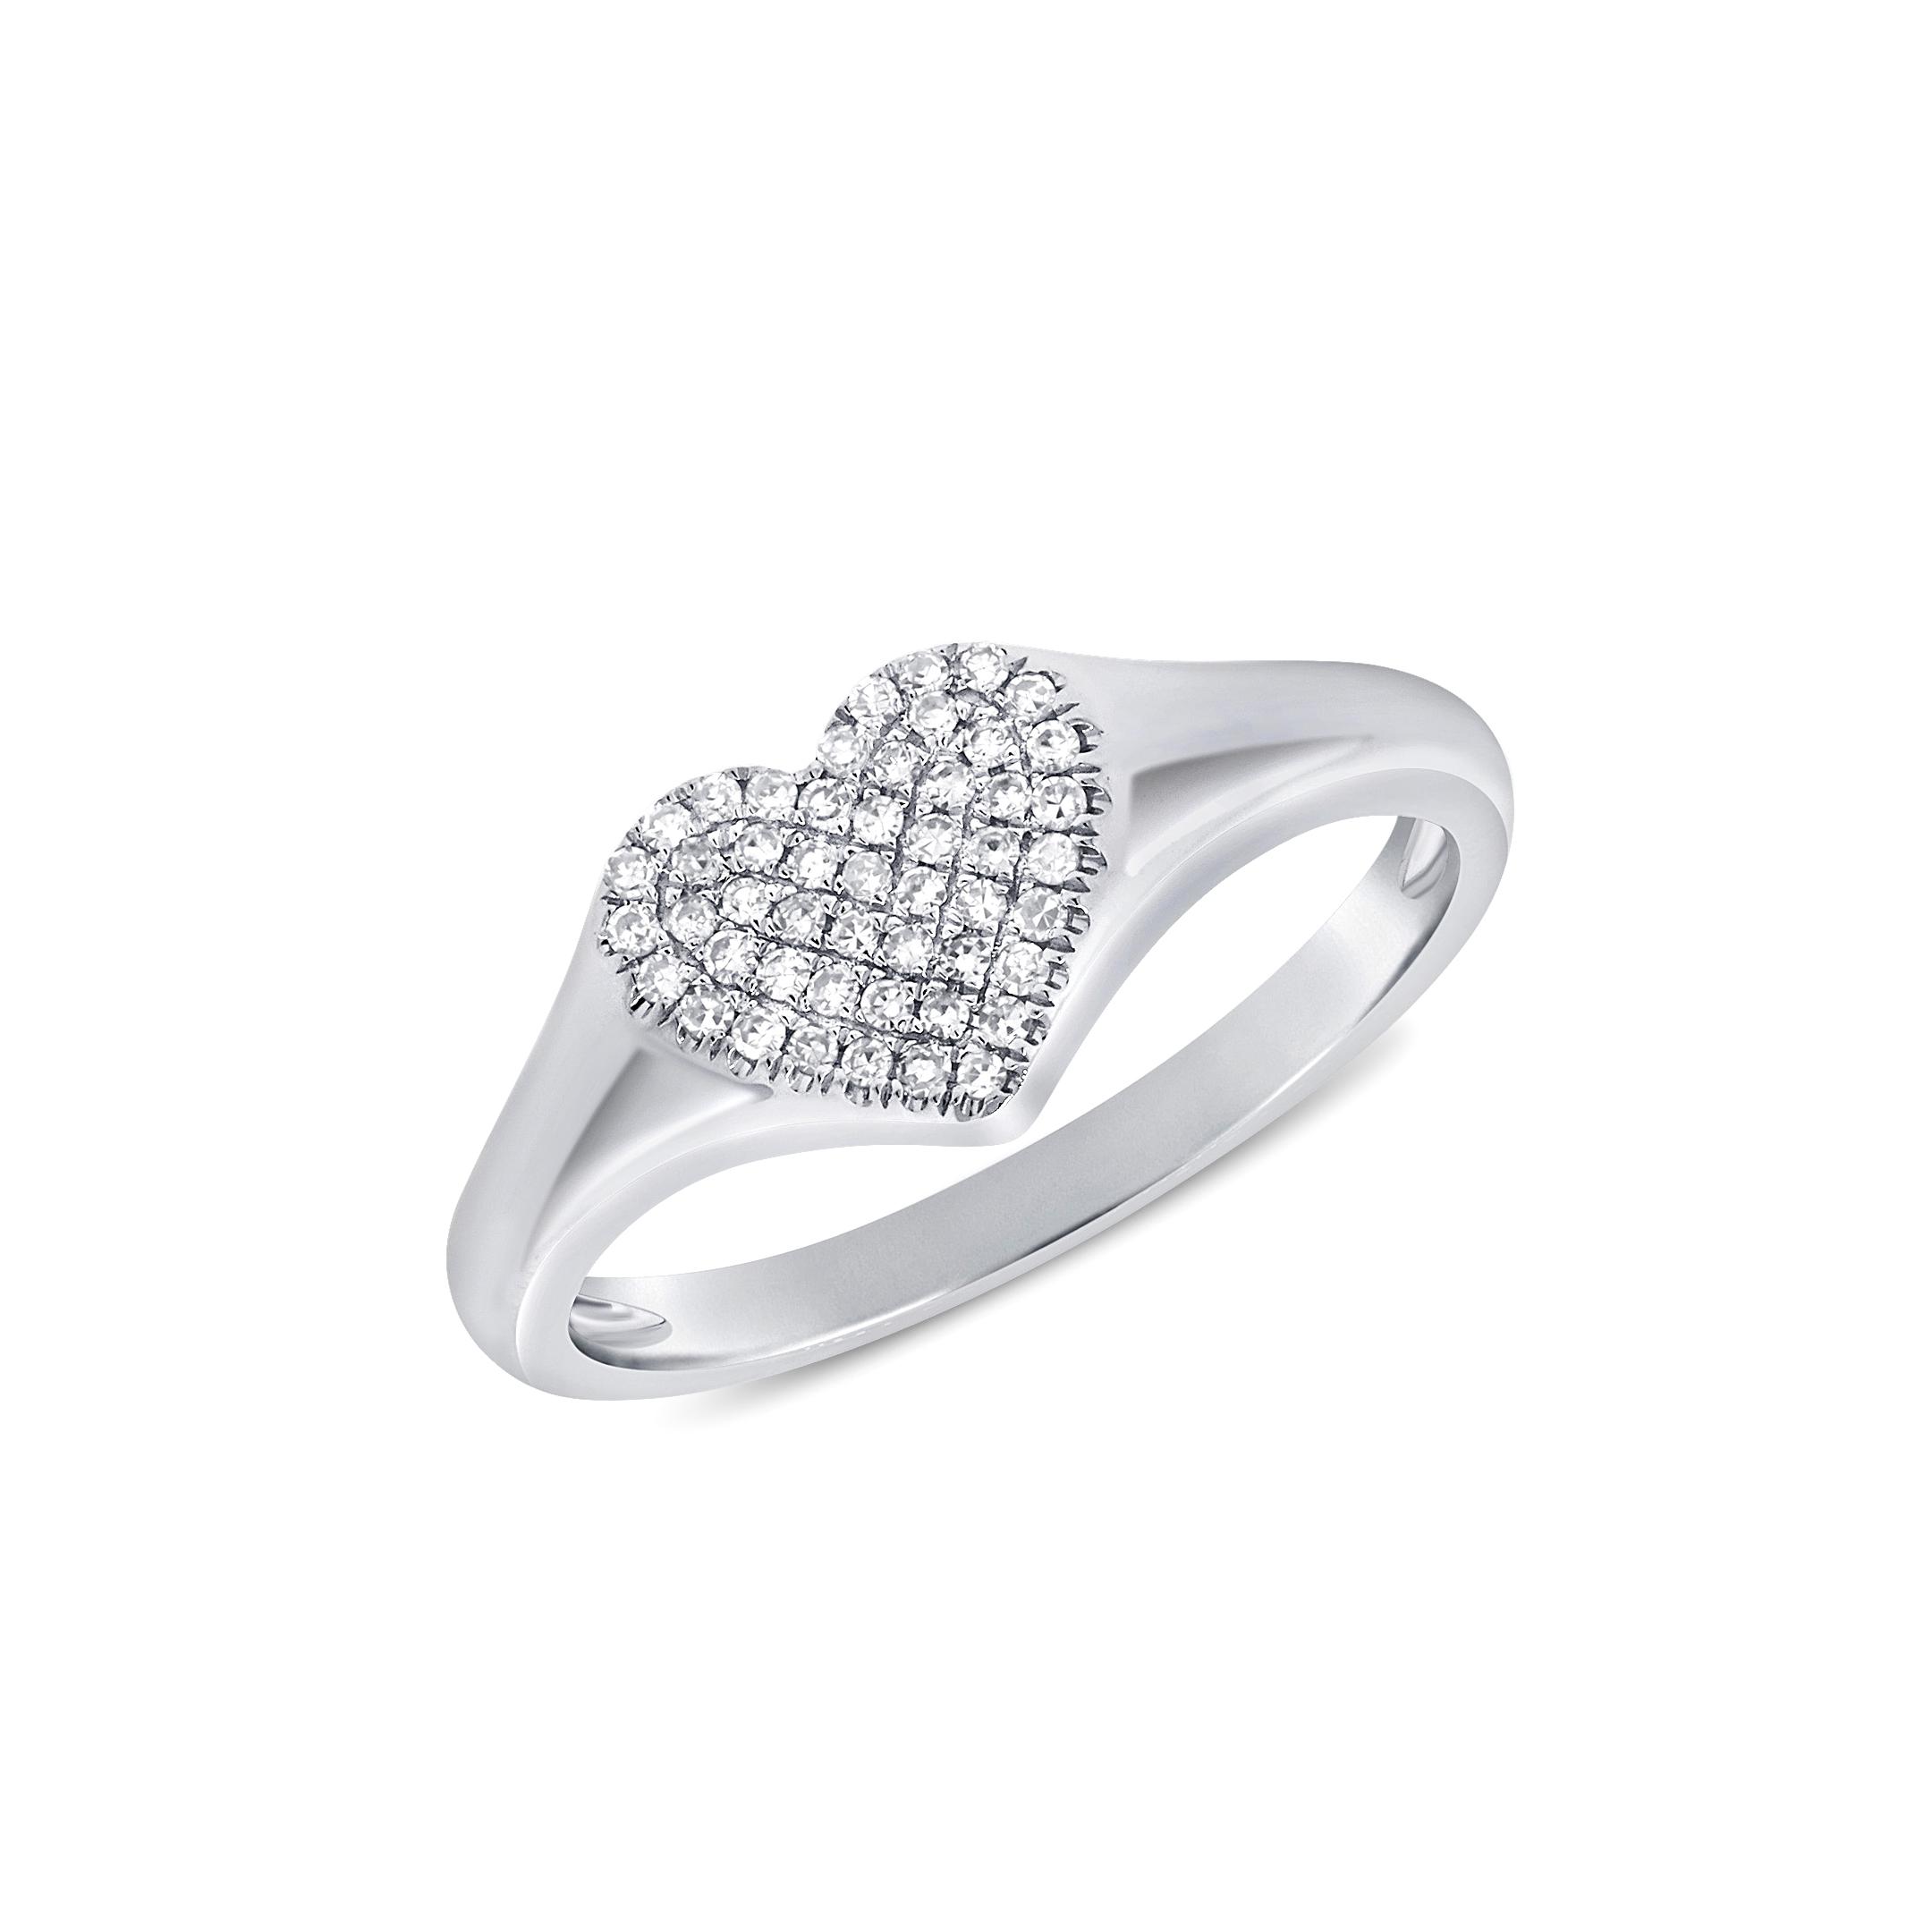 heart-shaped-pave-diamond-center-band-in-14-karat-white-gold